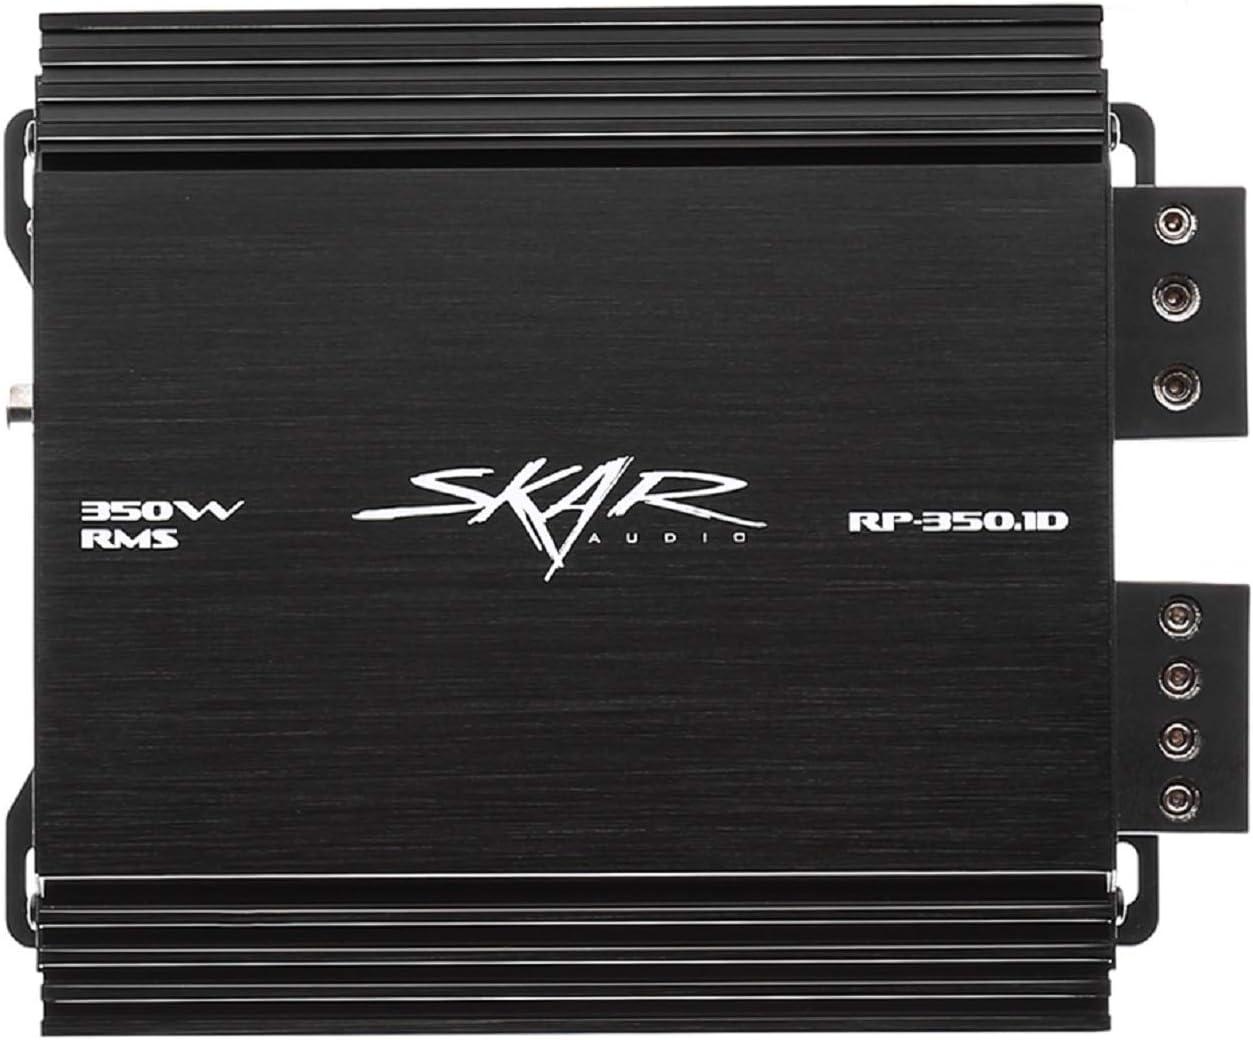 Skar Audio RP 350.1 D Car Amplifier with Remote Subwoofer